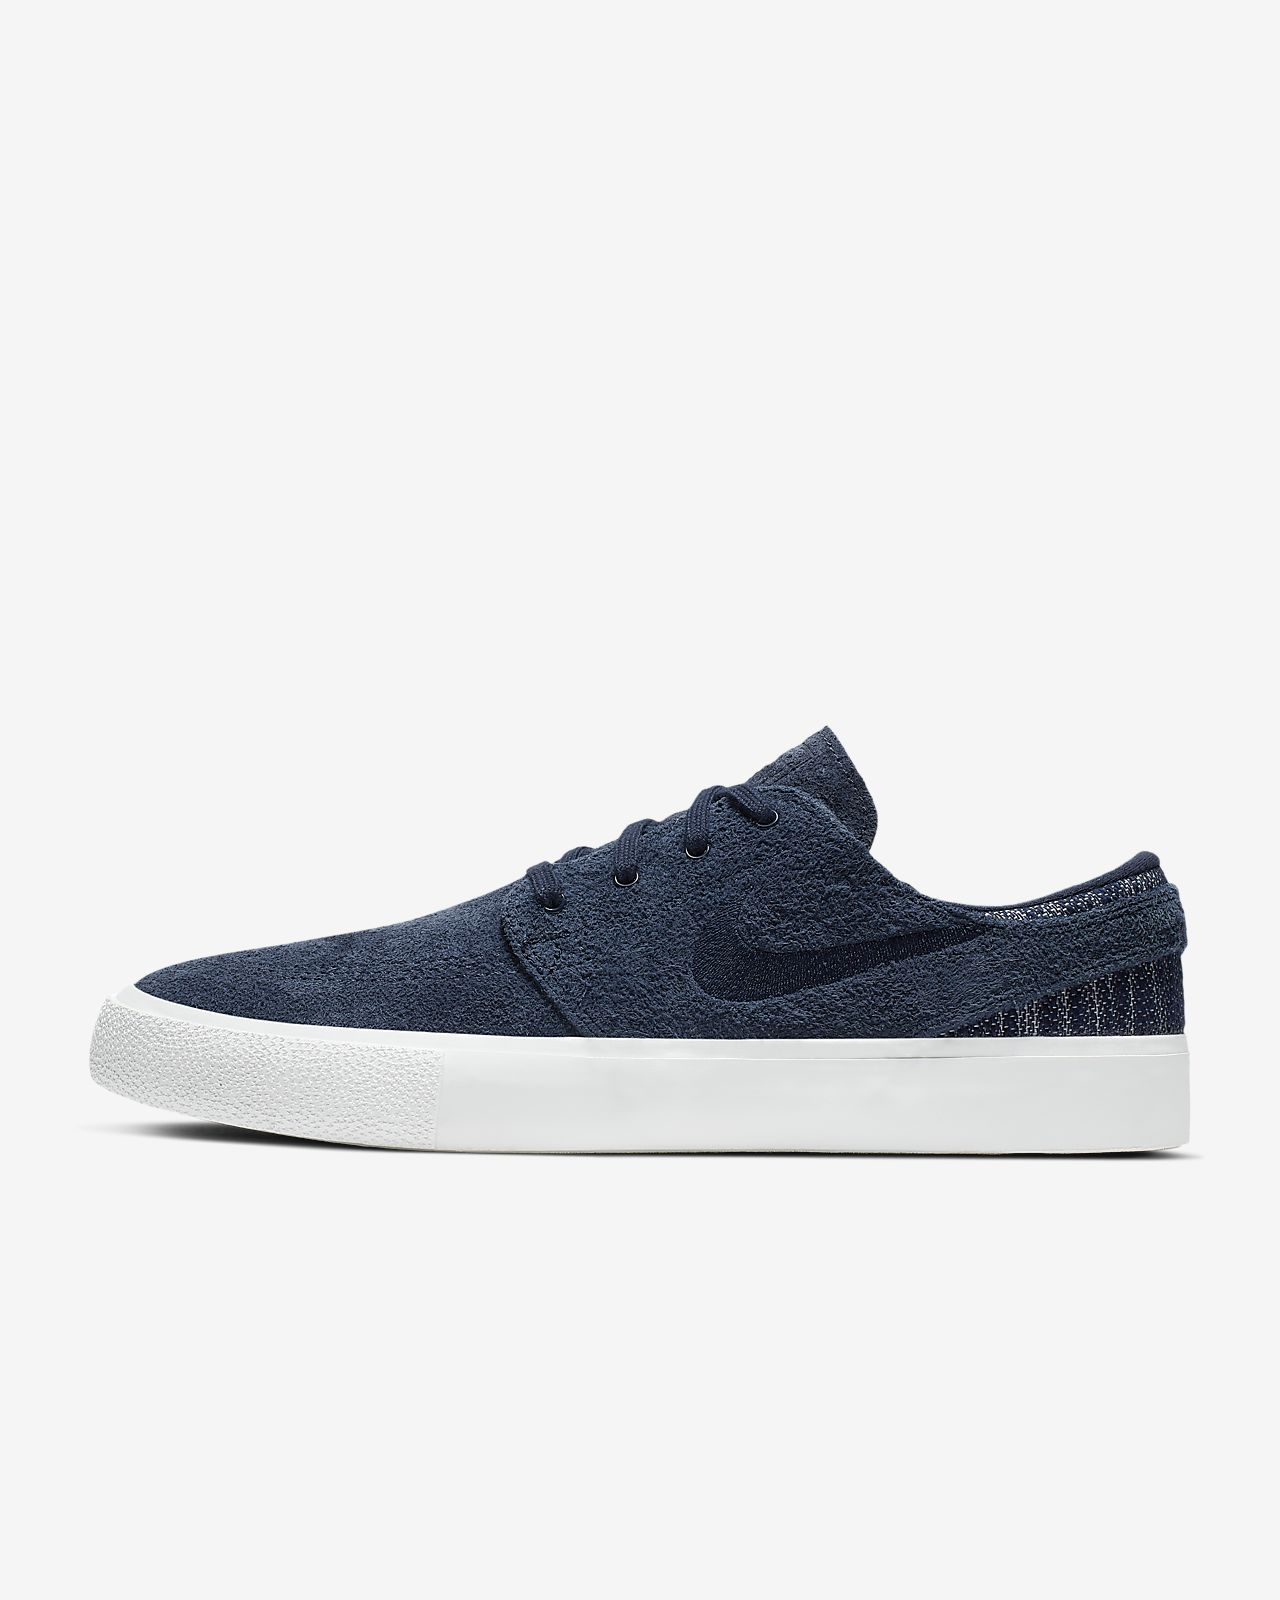 Nike SB Zoom Janoski RM PRM男/女滑板鞋